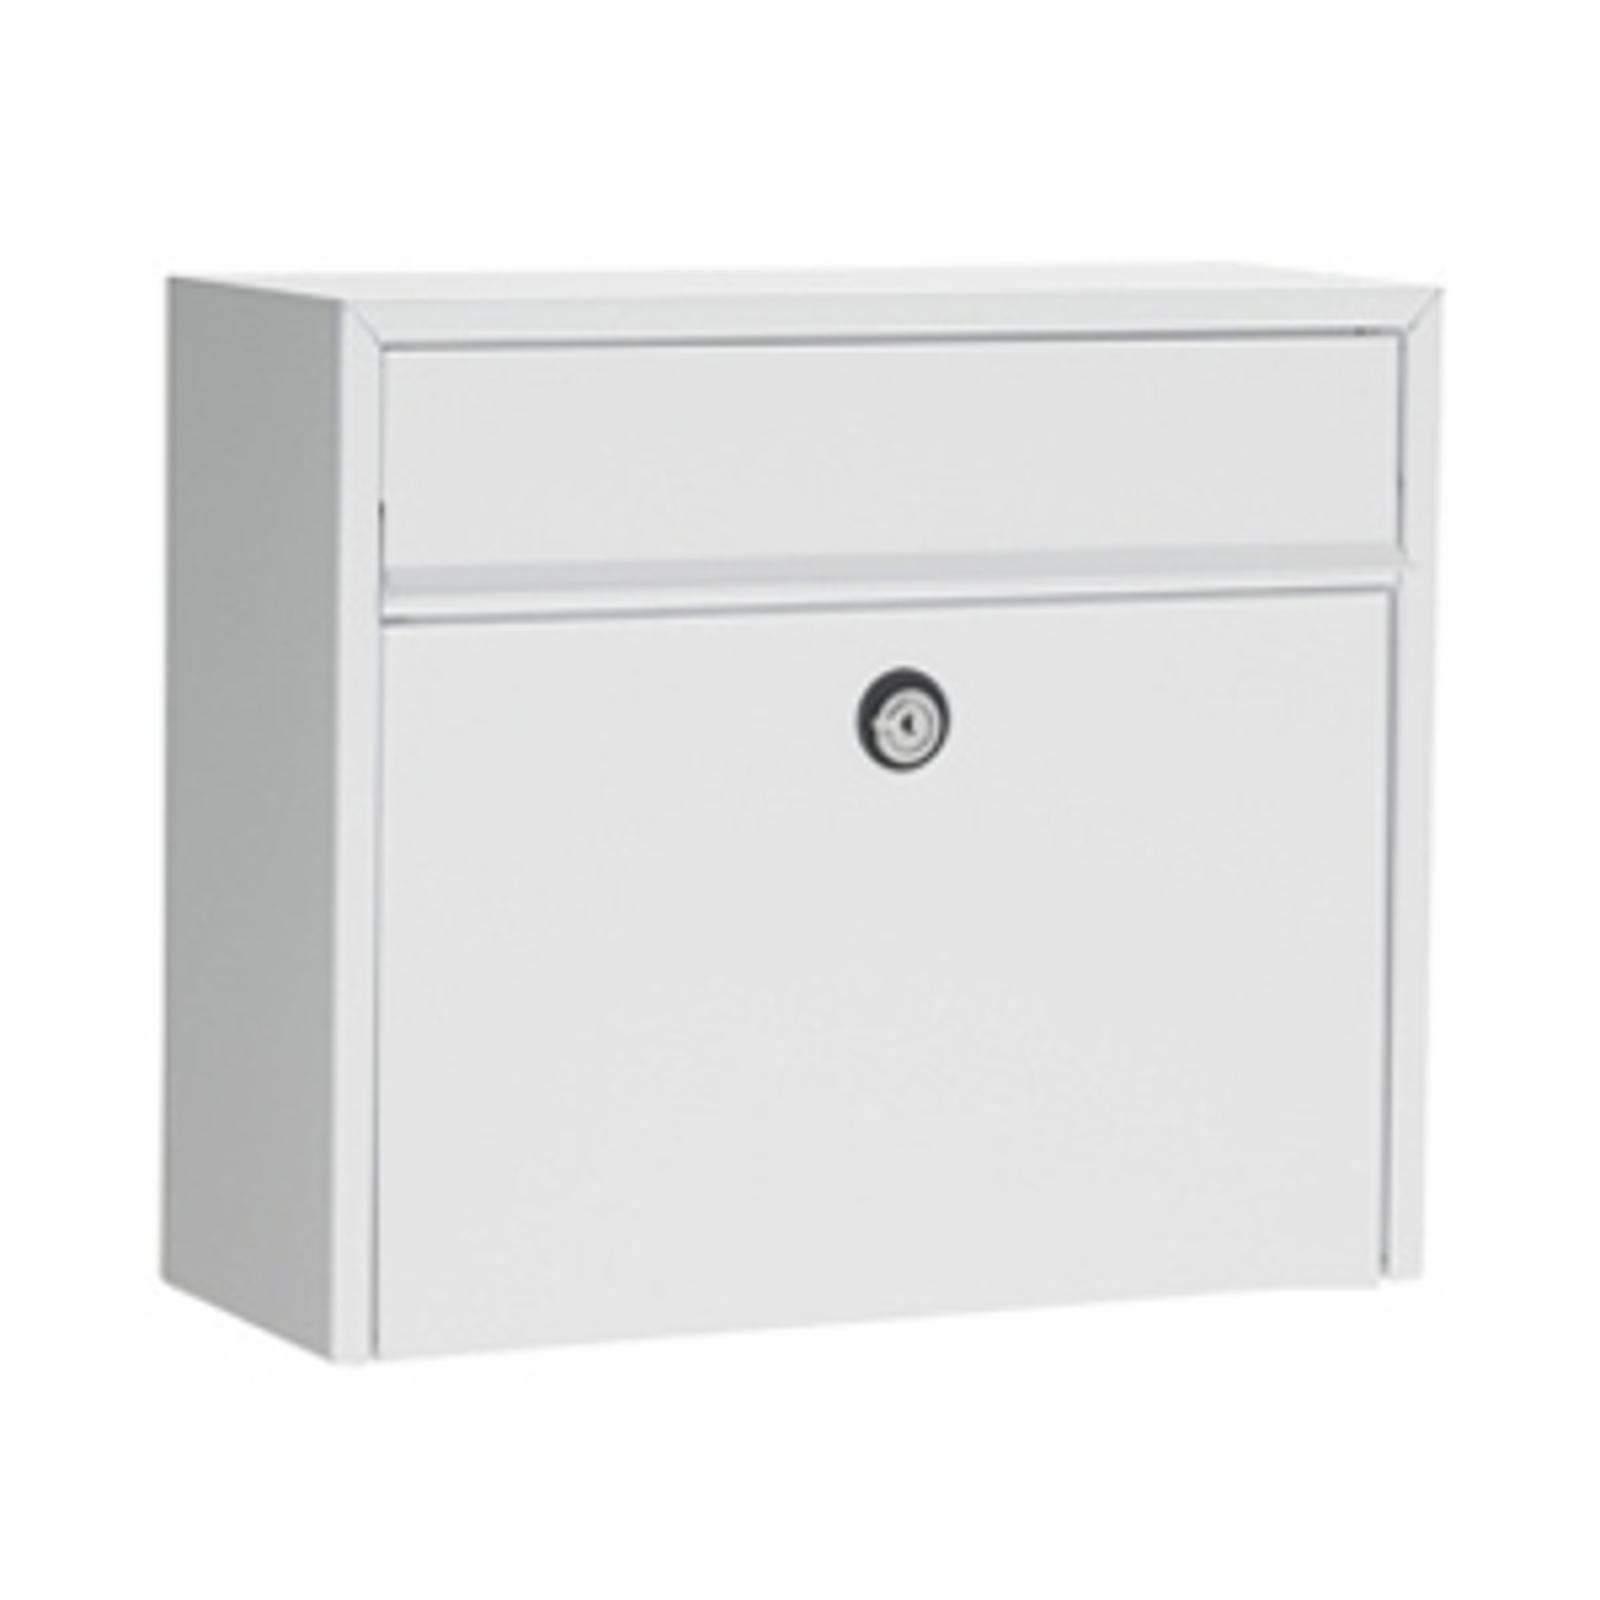 Semplice cassetta postale LT150, bianco, Euro